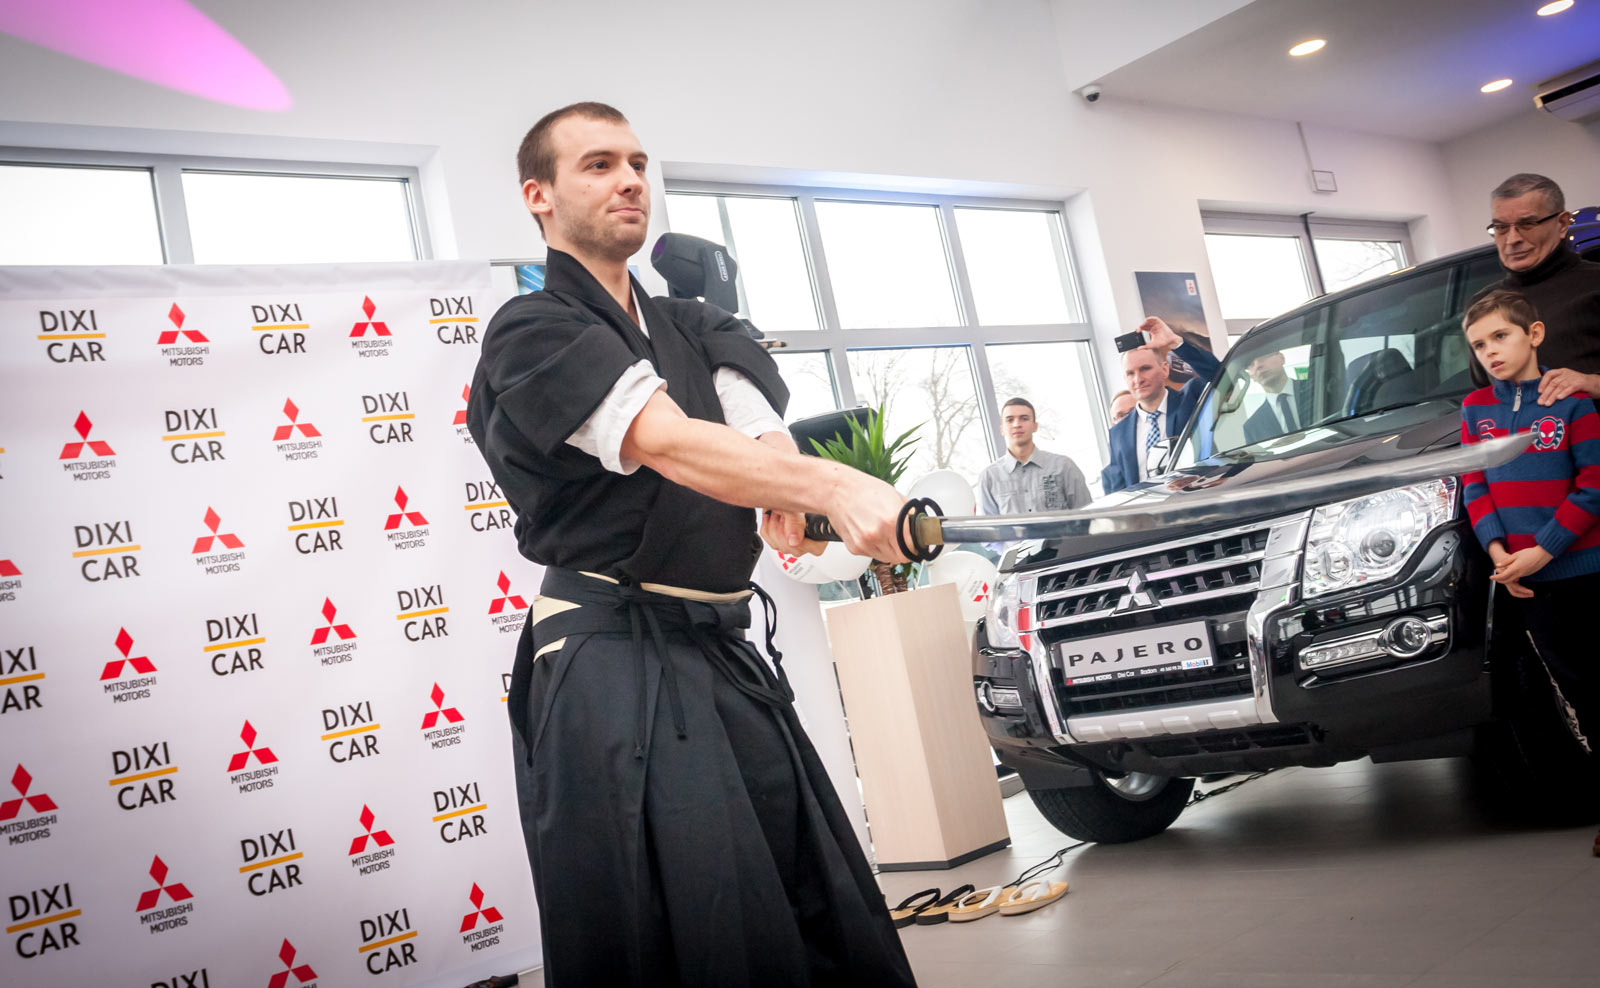 Salon Dixi-Car, samuraj, Mitsubishi Pajero